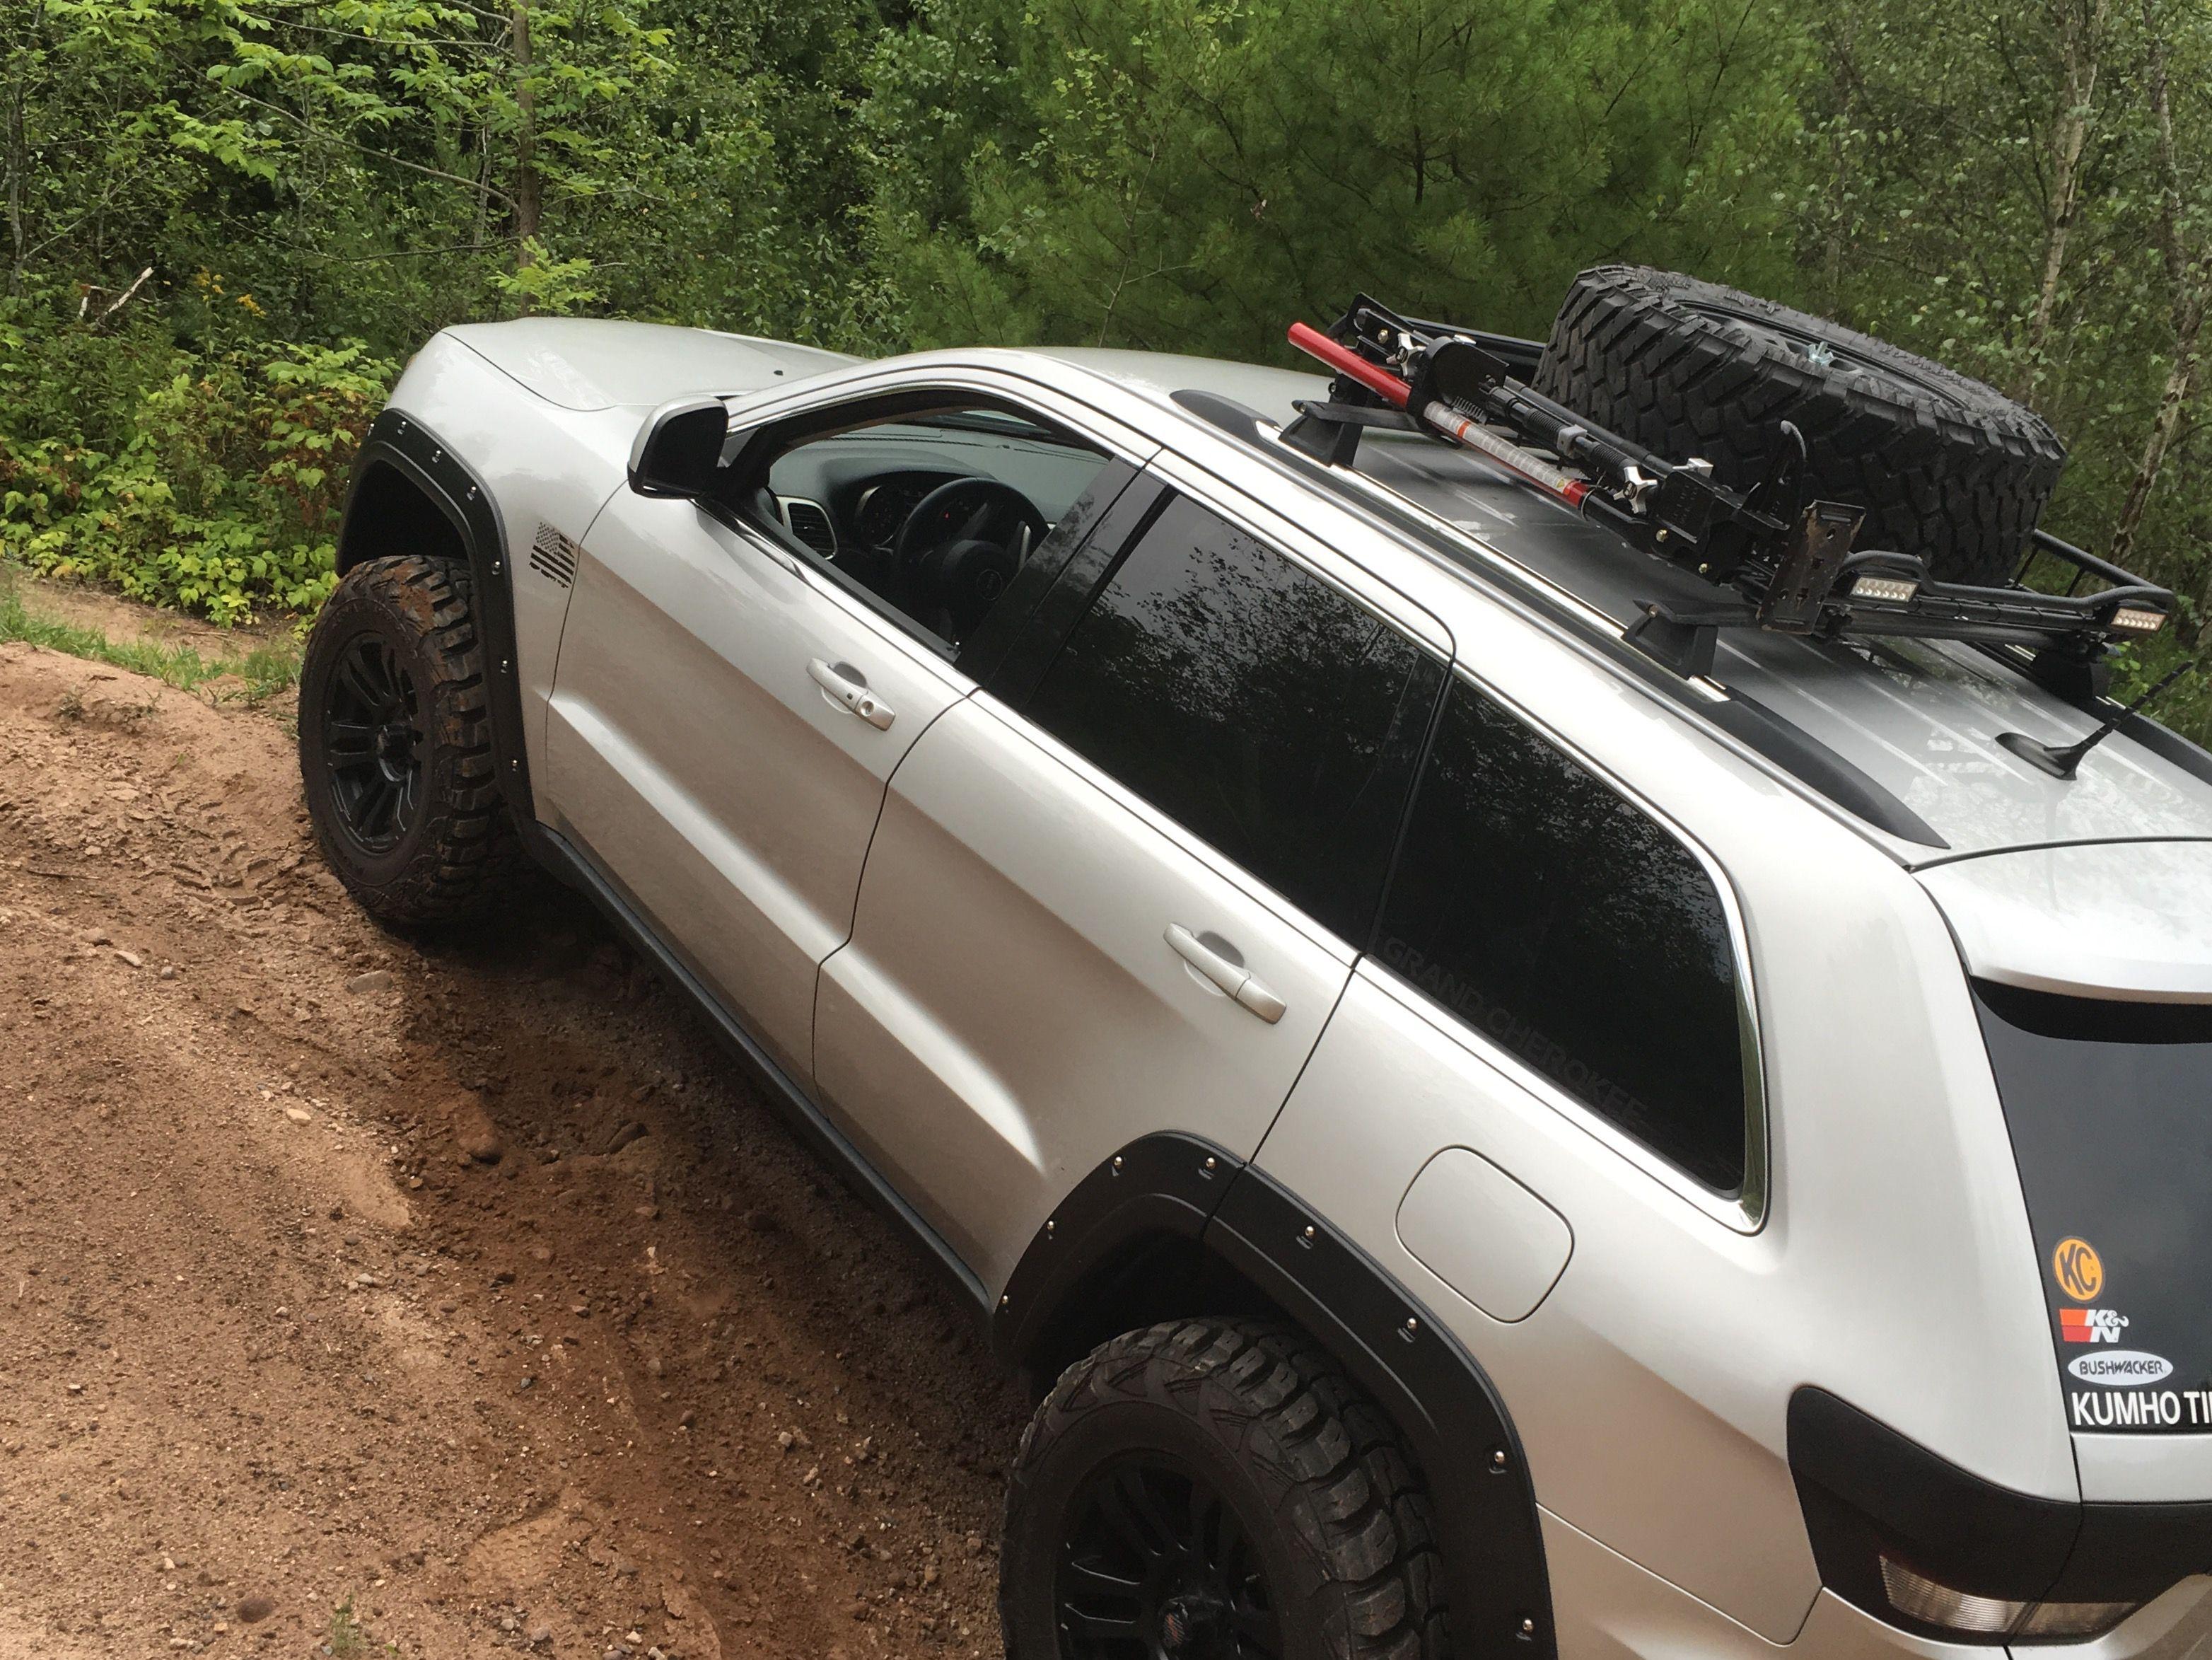 roof rack grand new avanza harga toyota 2018 jeep cherokee wk2 kumho tires bushwackers hilift